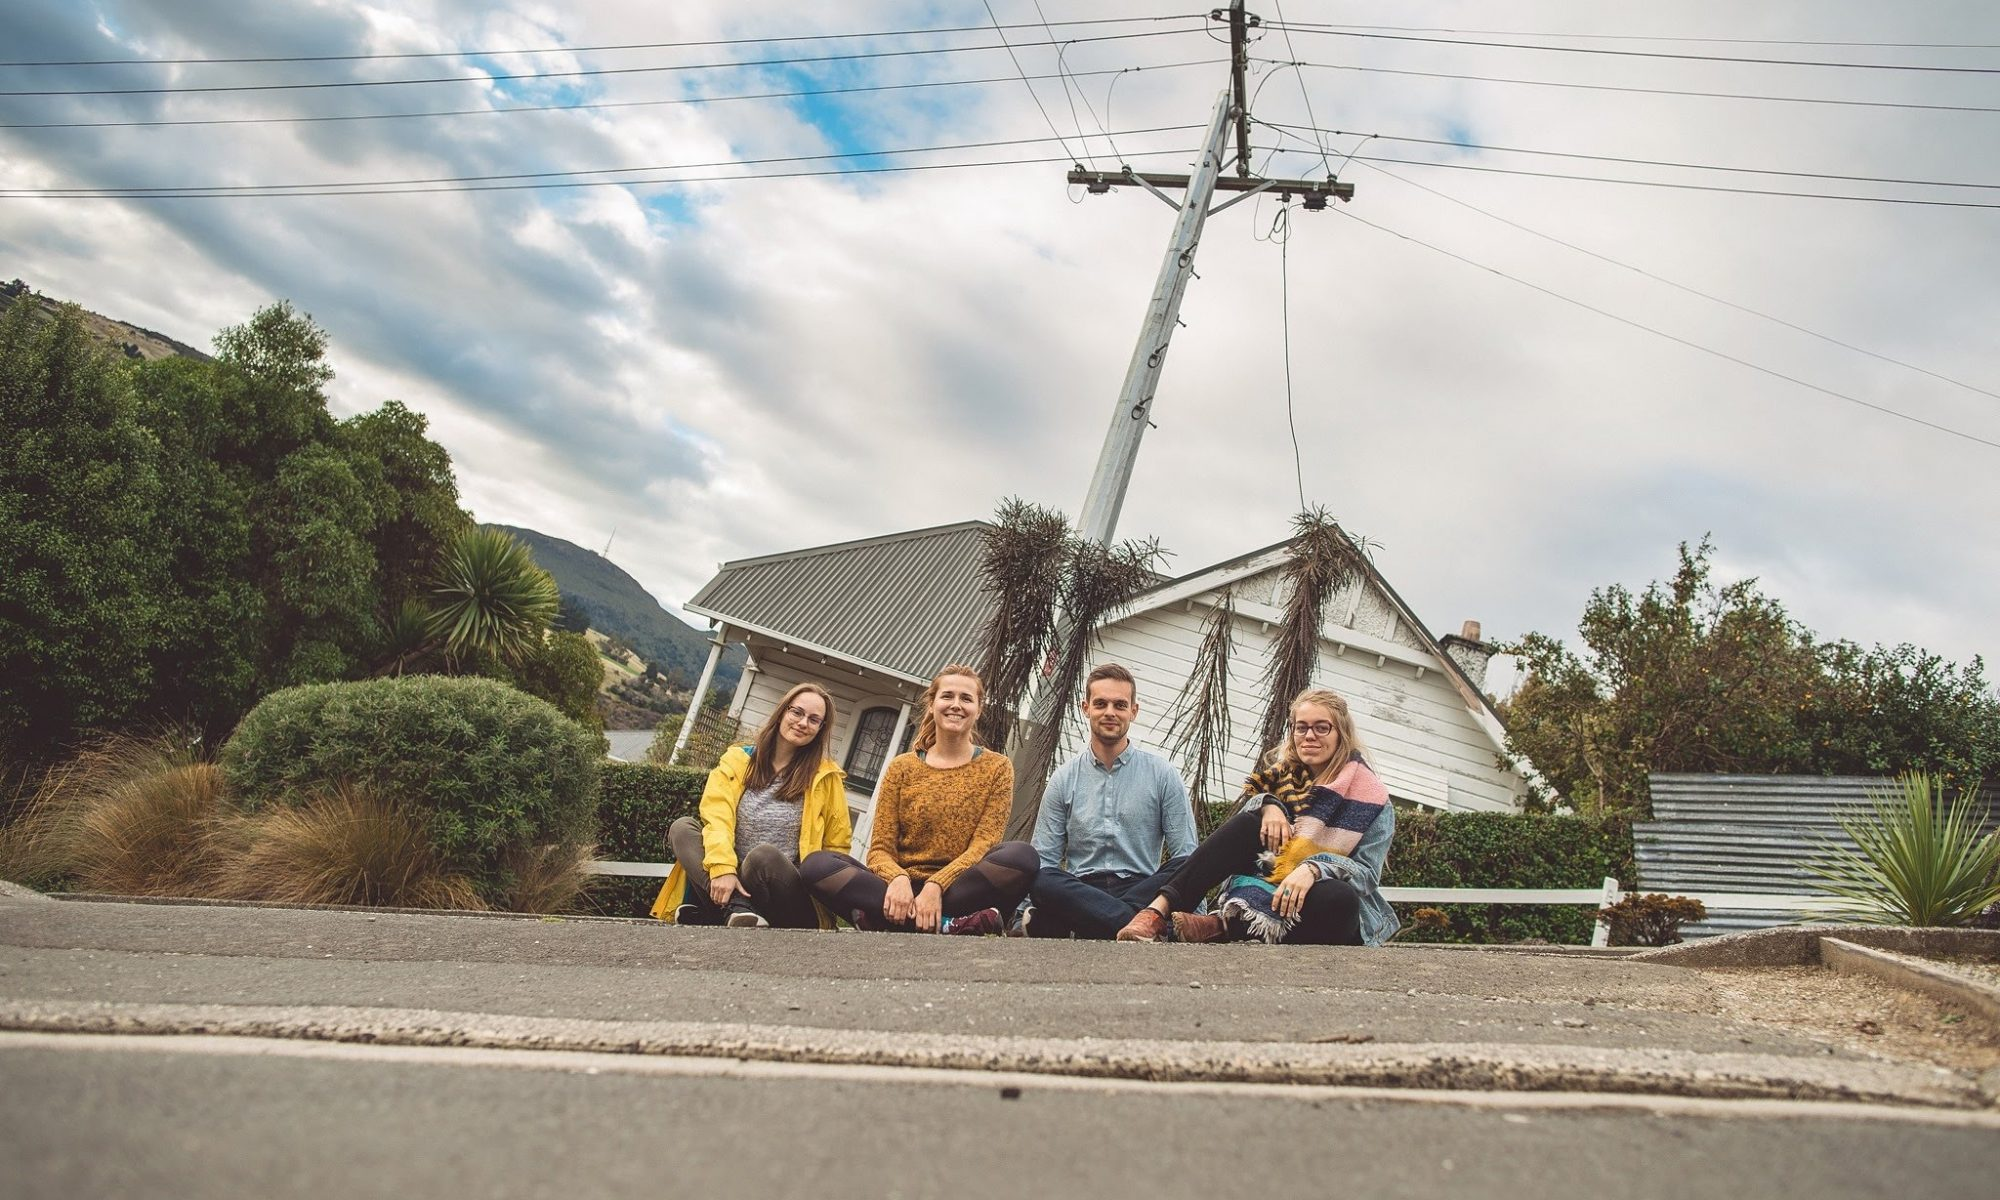 Baldwin street, Dunedin, NZ